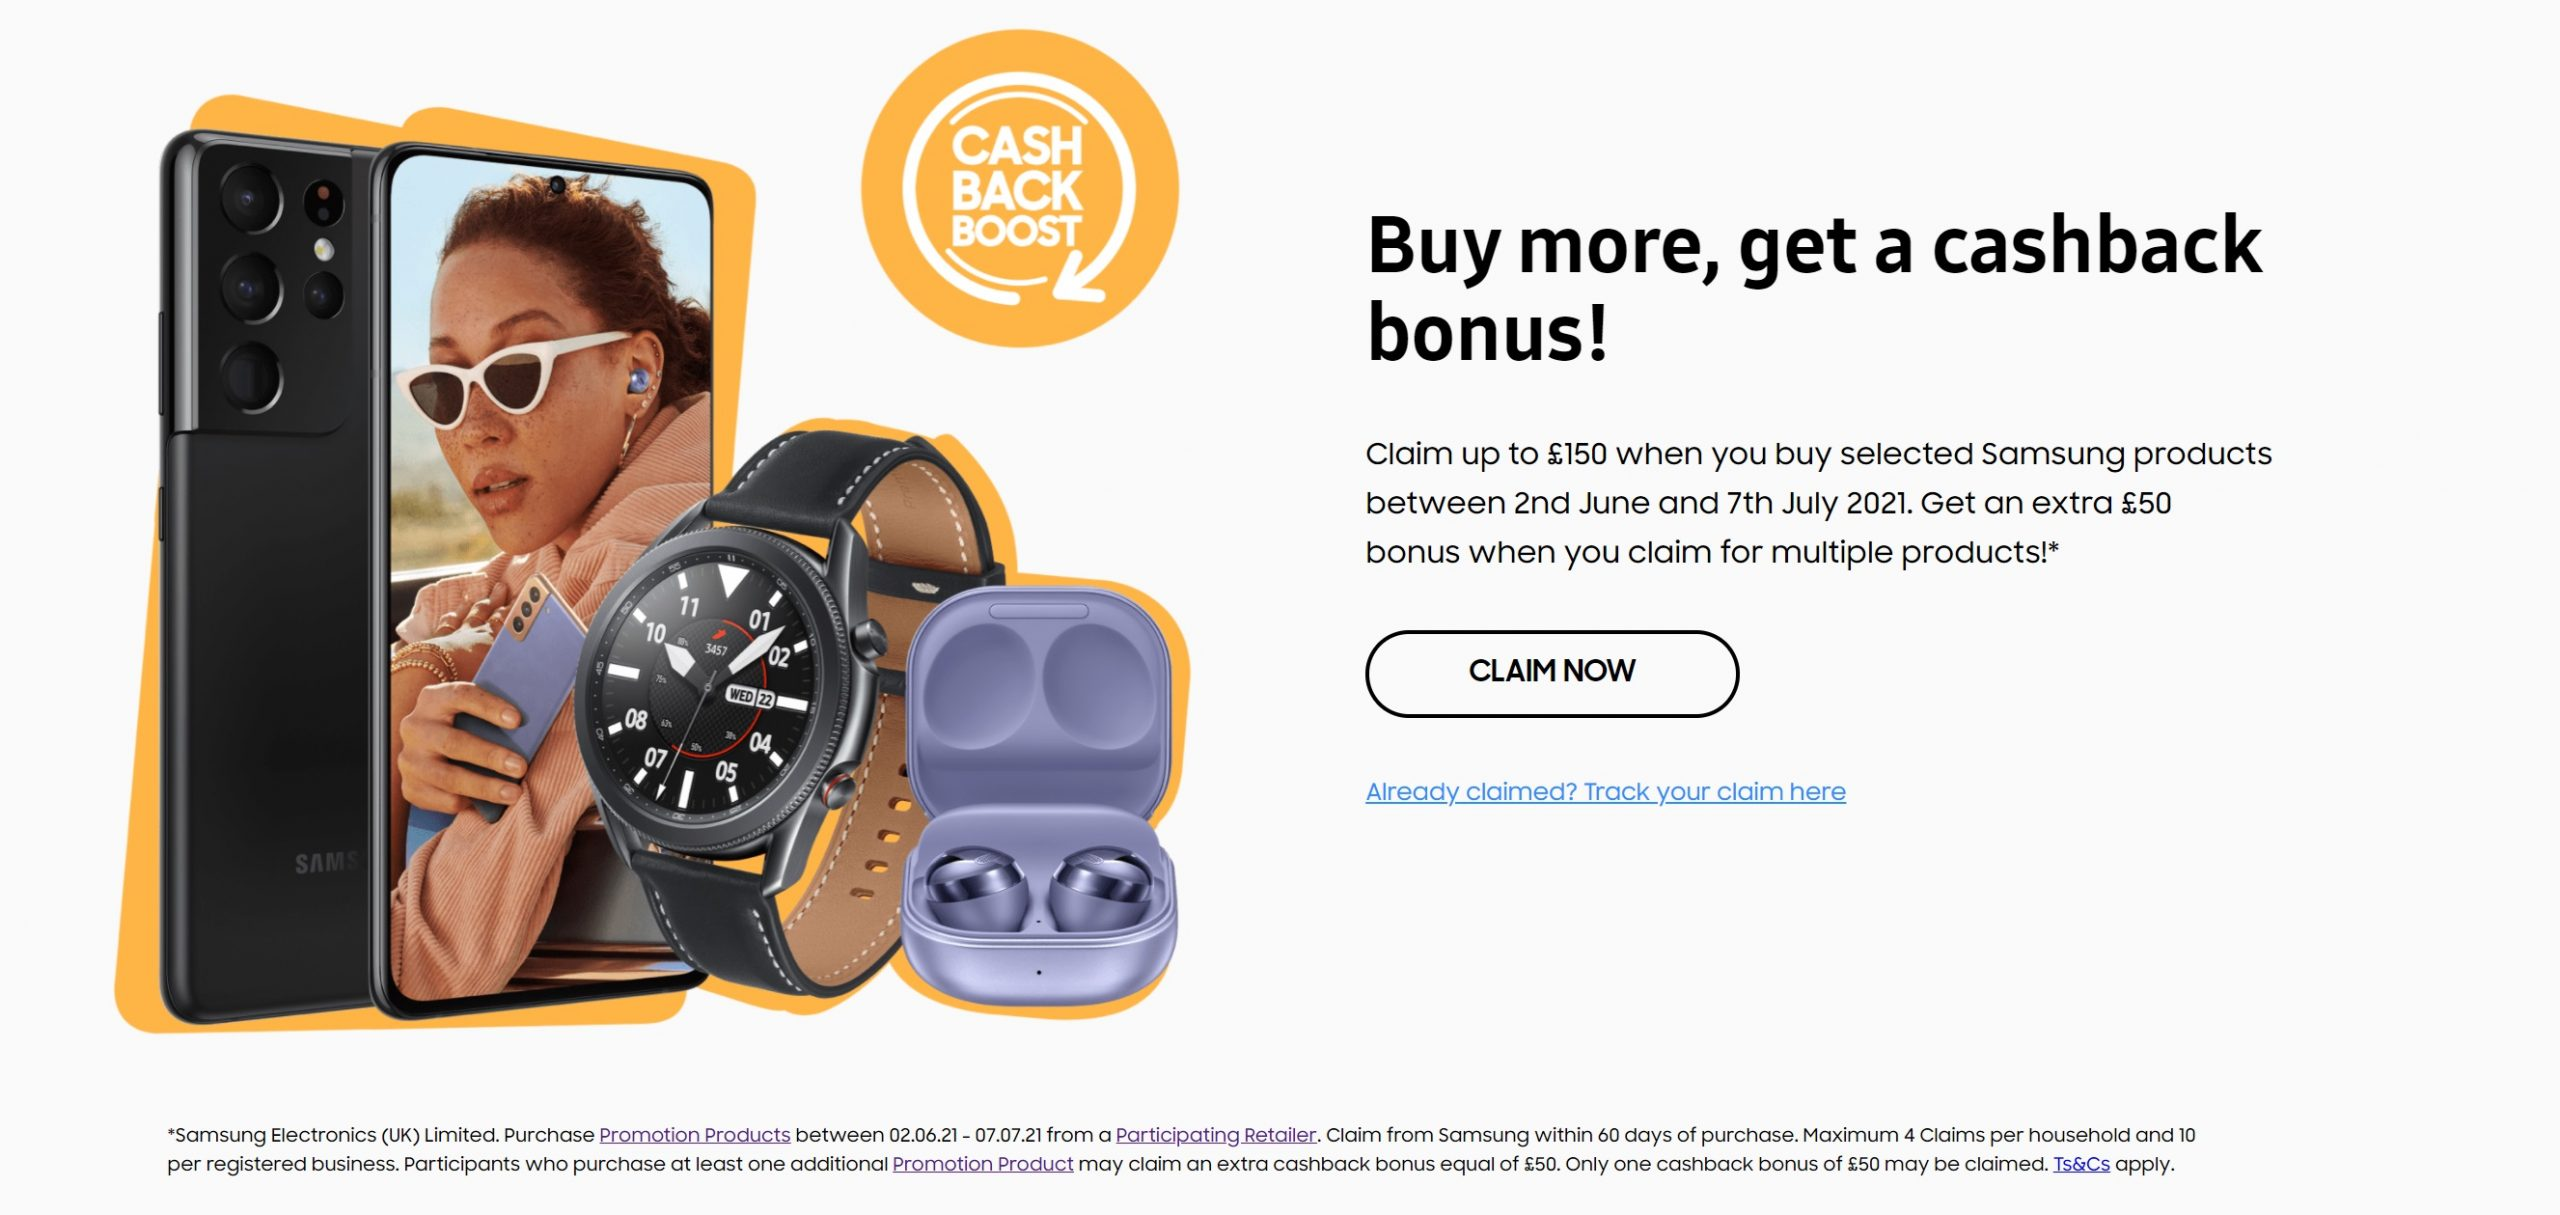 Samsung's Summer Cashback Boost - Claim up to an extra £150 cashback